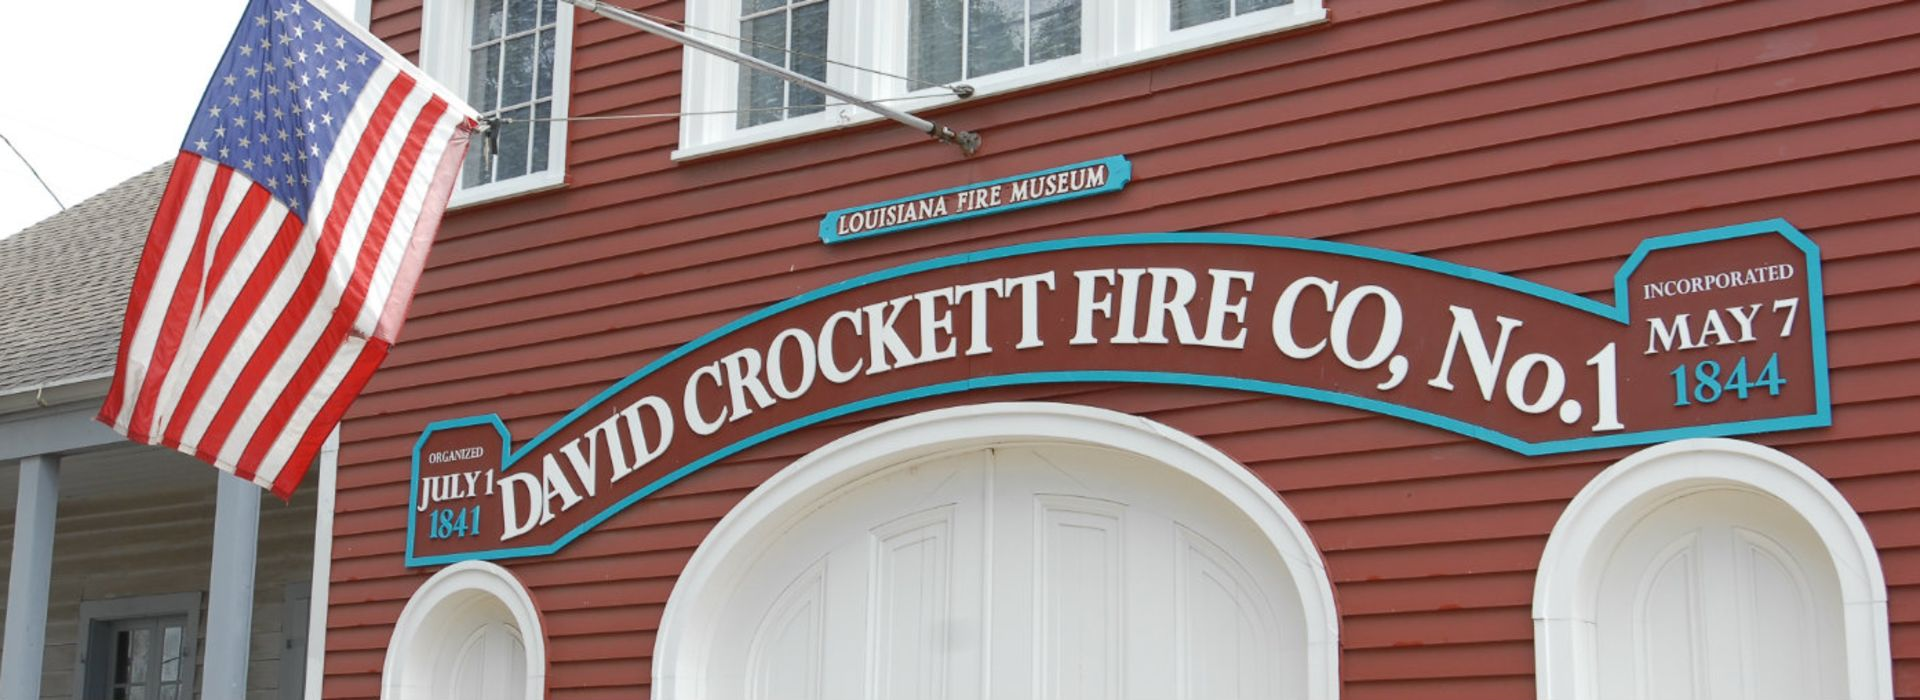 David Crocket Firehouse